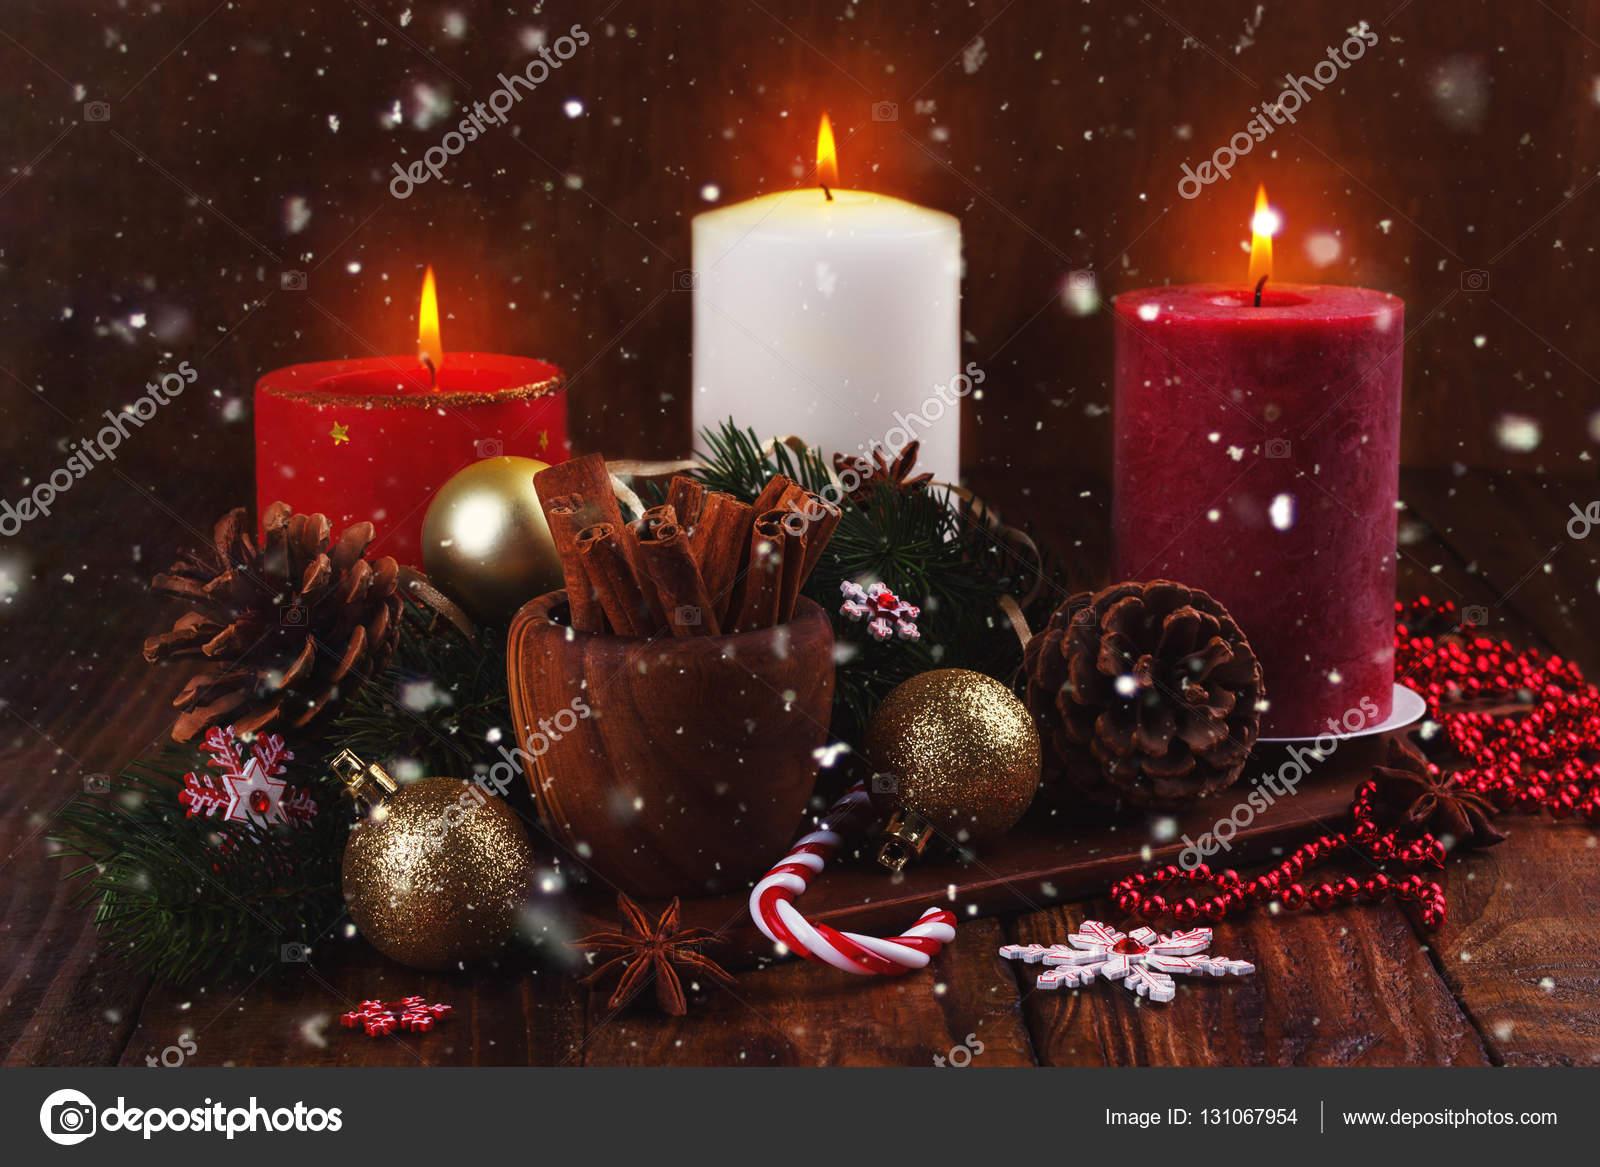 Immagini Natalizie Candele.Ornamenti E Candele Natalizie Foto Stock C Lana M 131067954